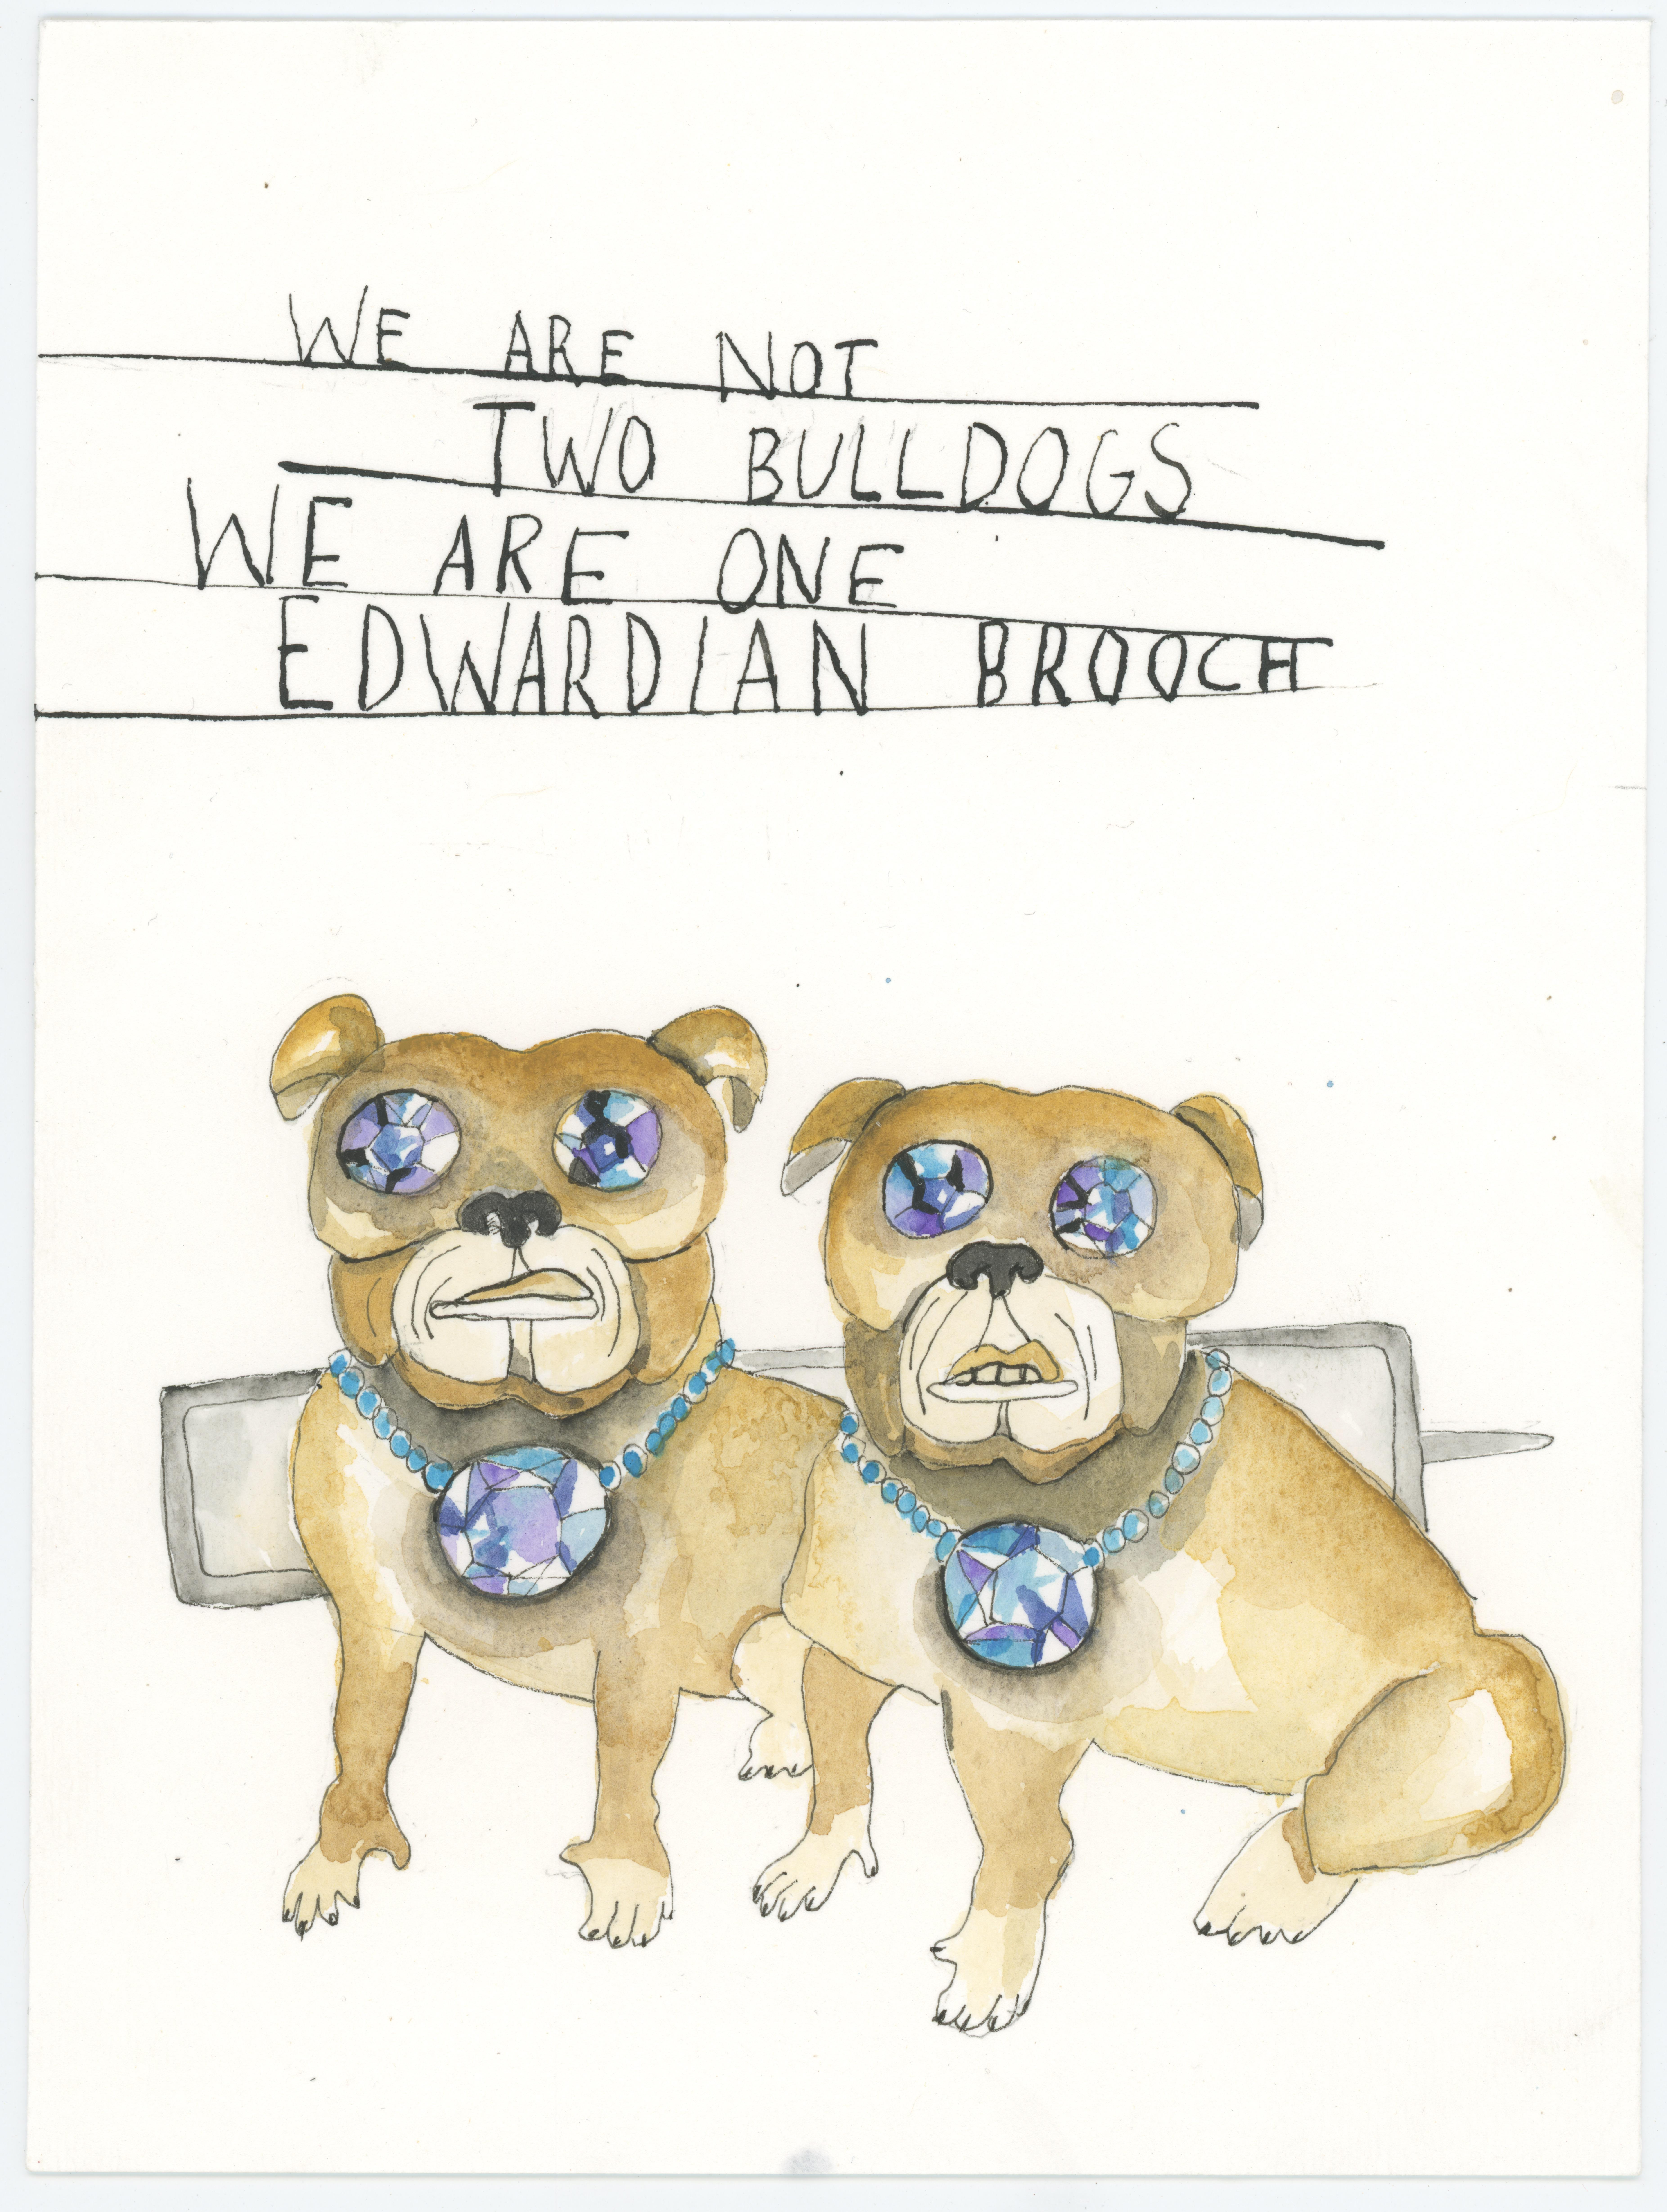 Not 2 bulldogs